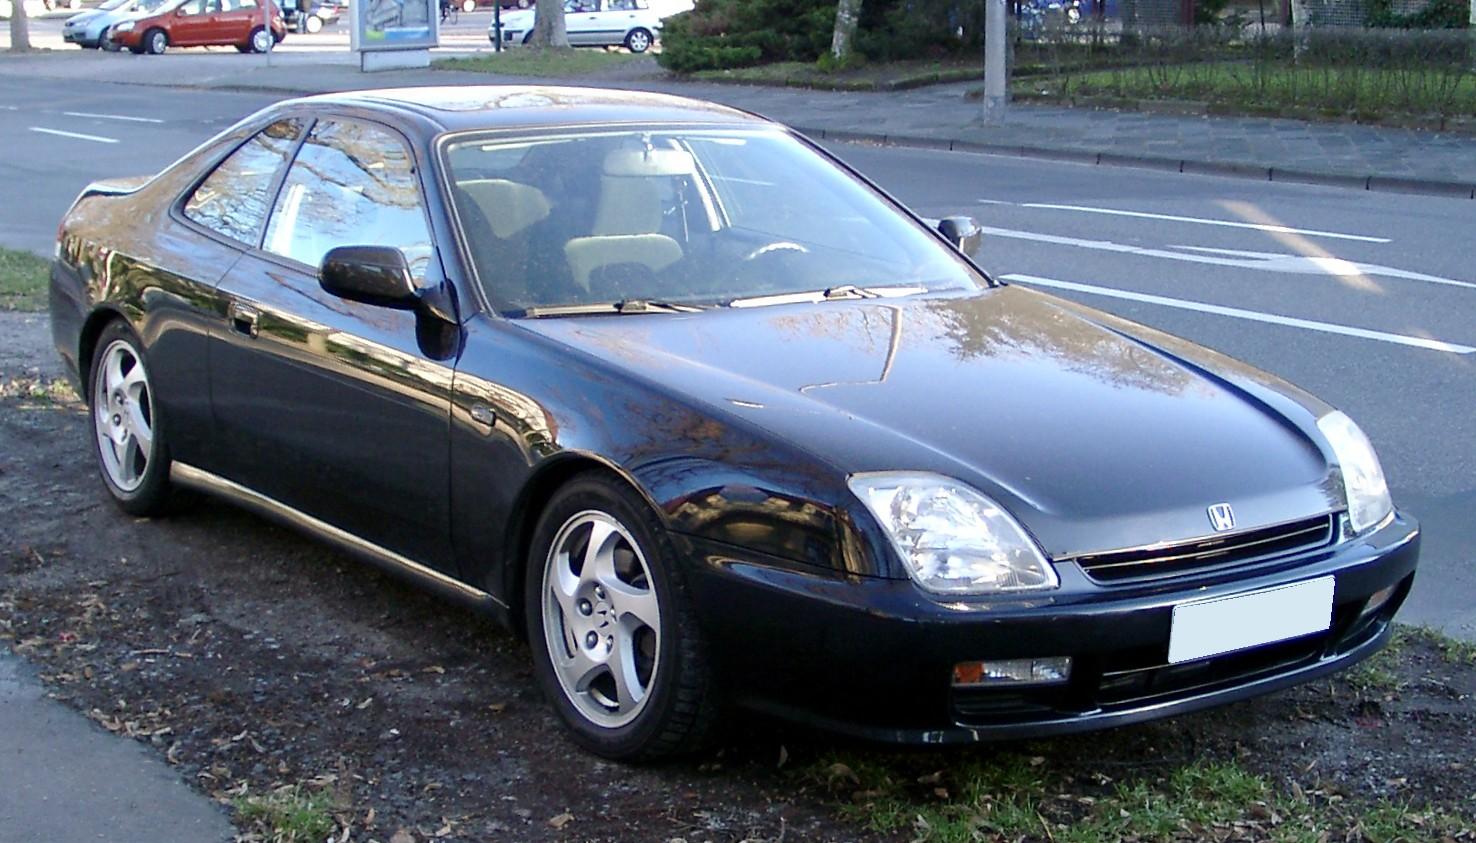 File:Honda Prelude 5 front 20080220.jpg - Wikimedia Commons